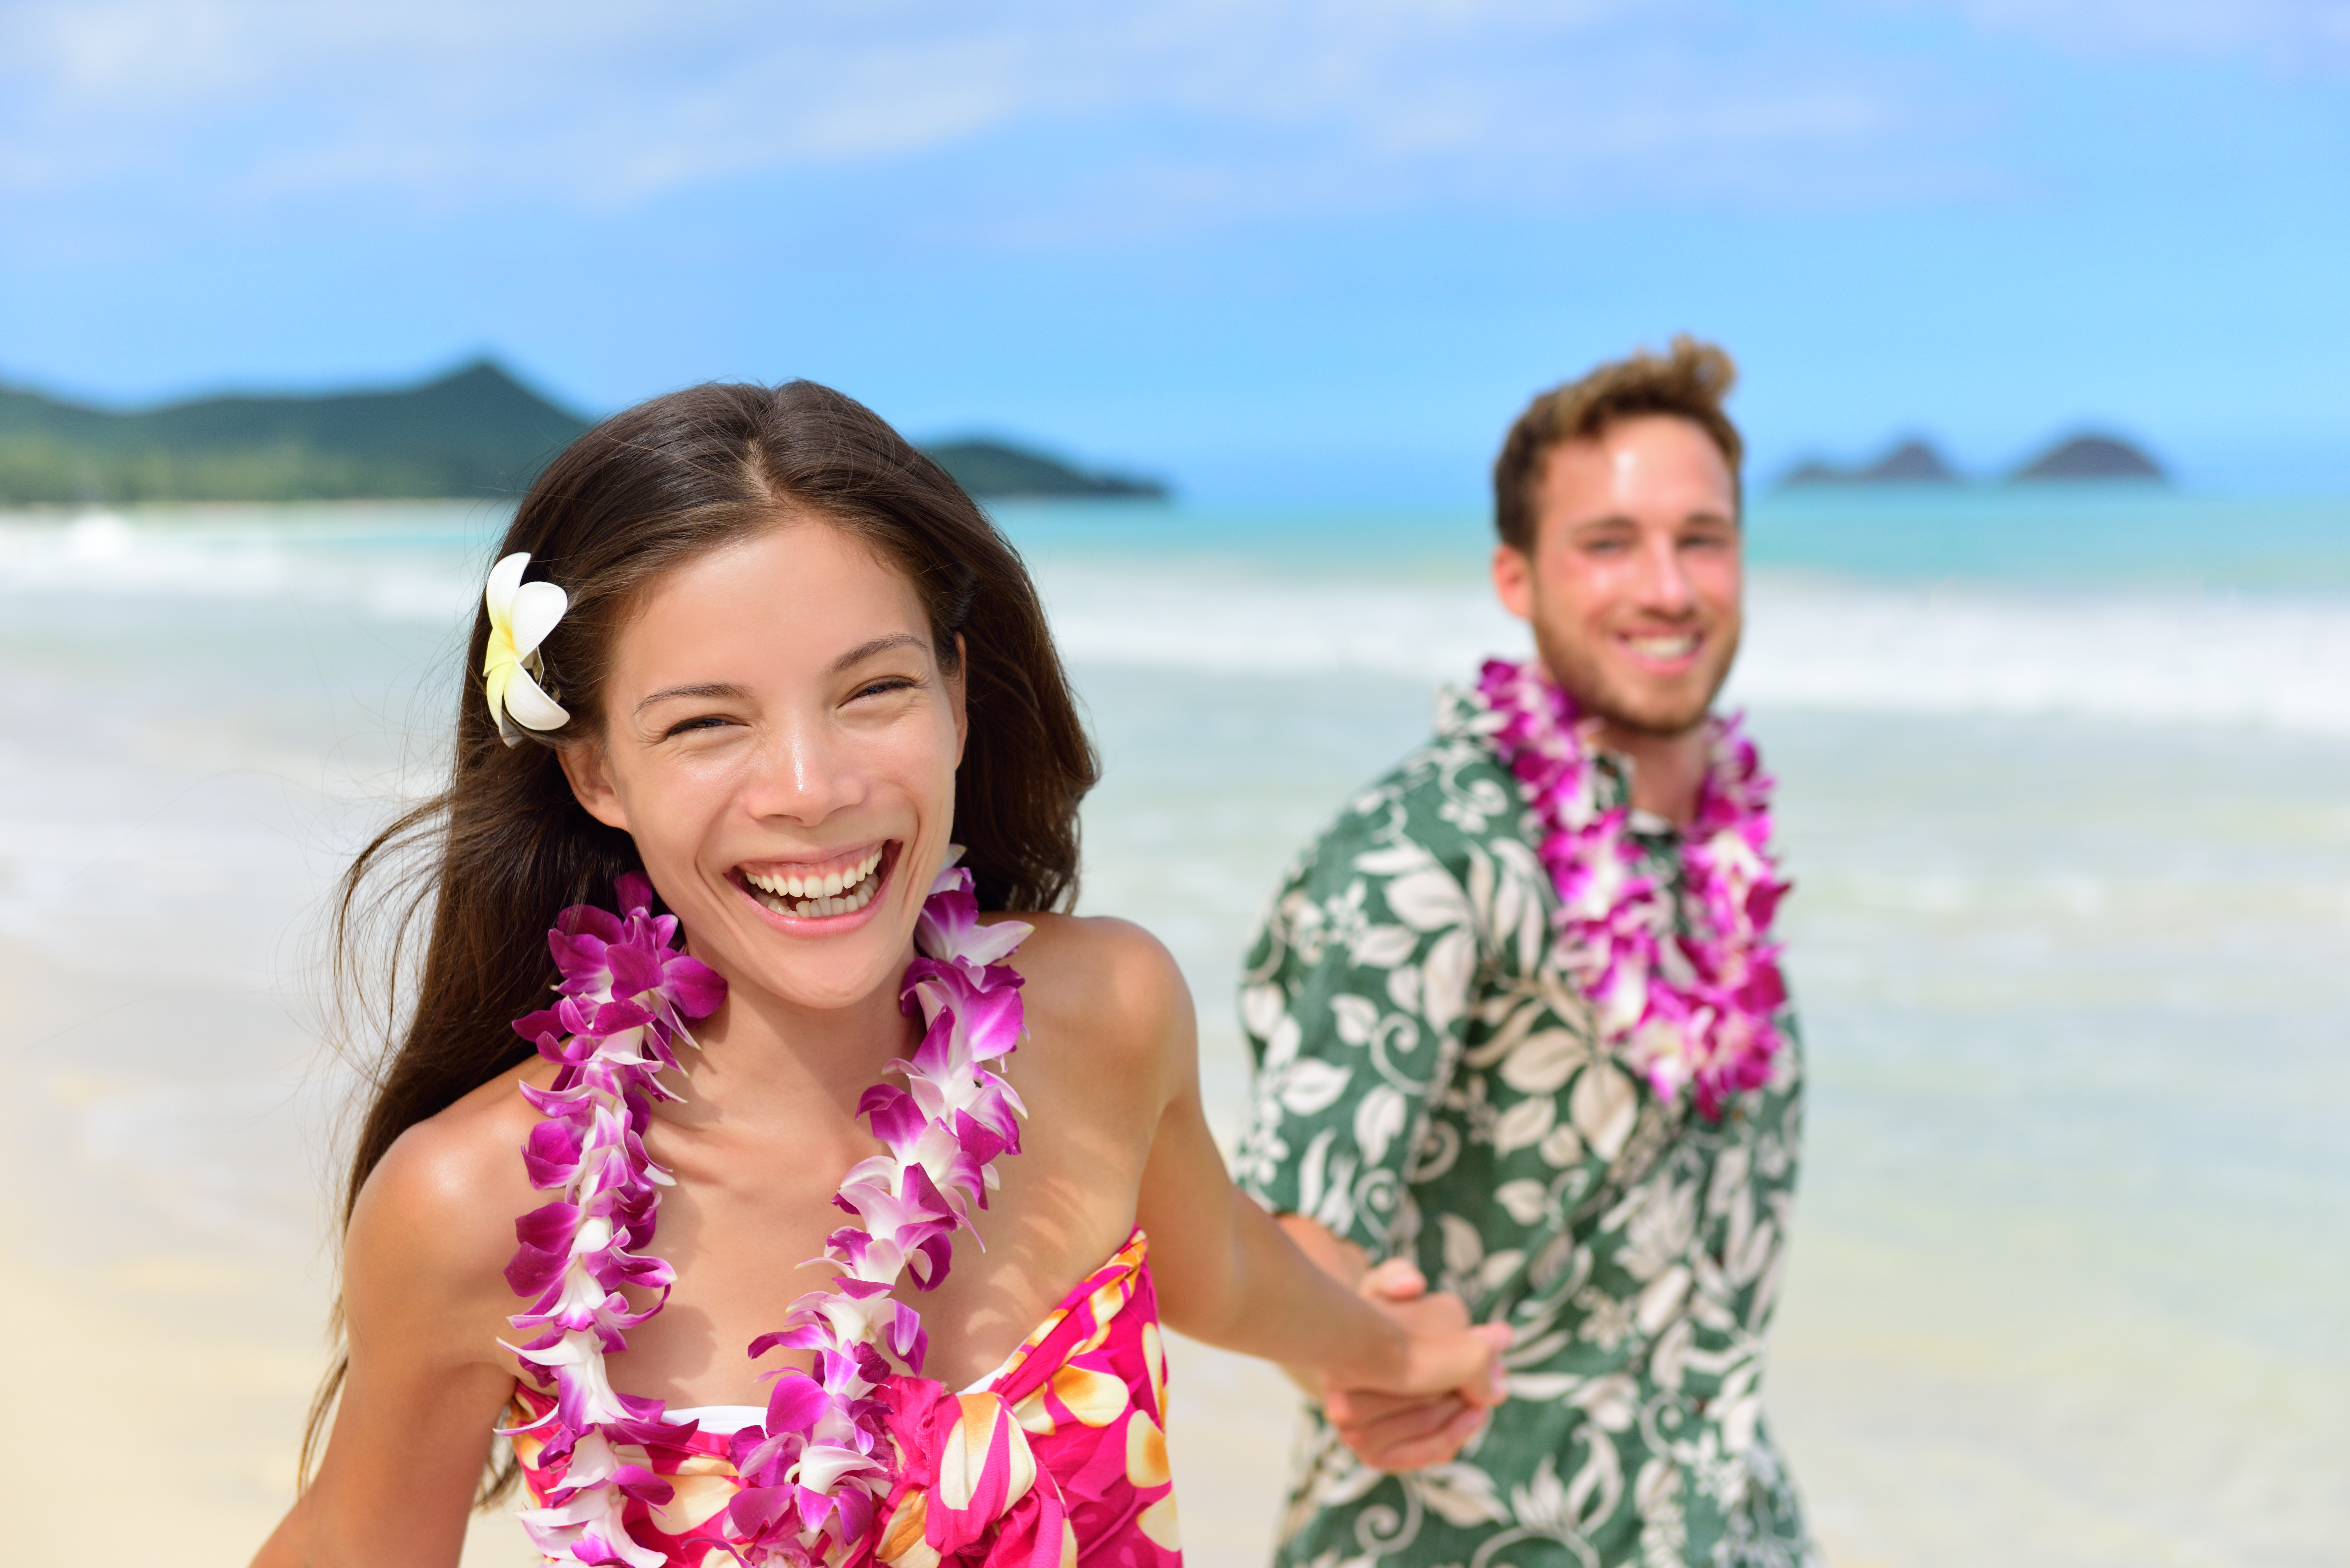 Destination Wedding Review.Understanding The Real Cost Of A Destination Wedding Bliss Honeymoons